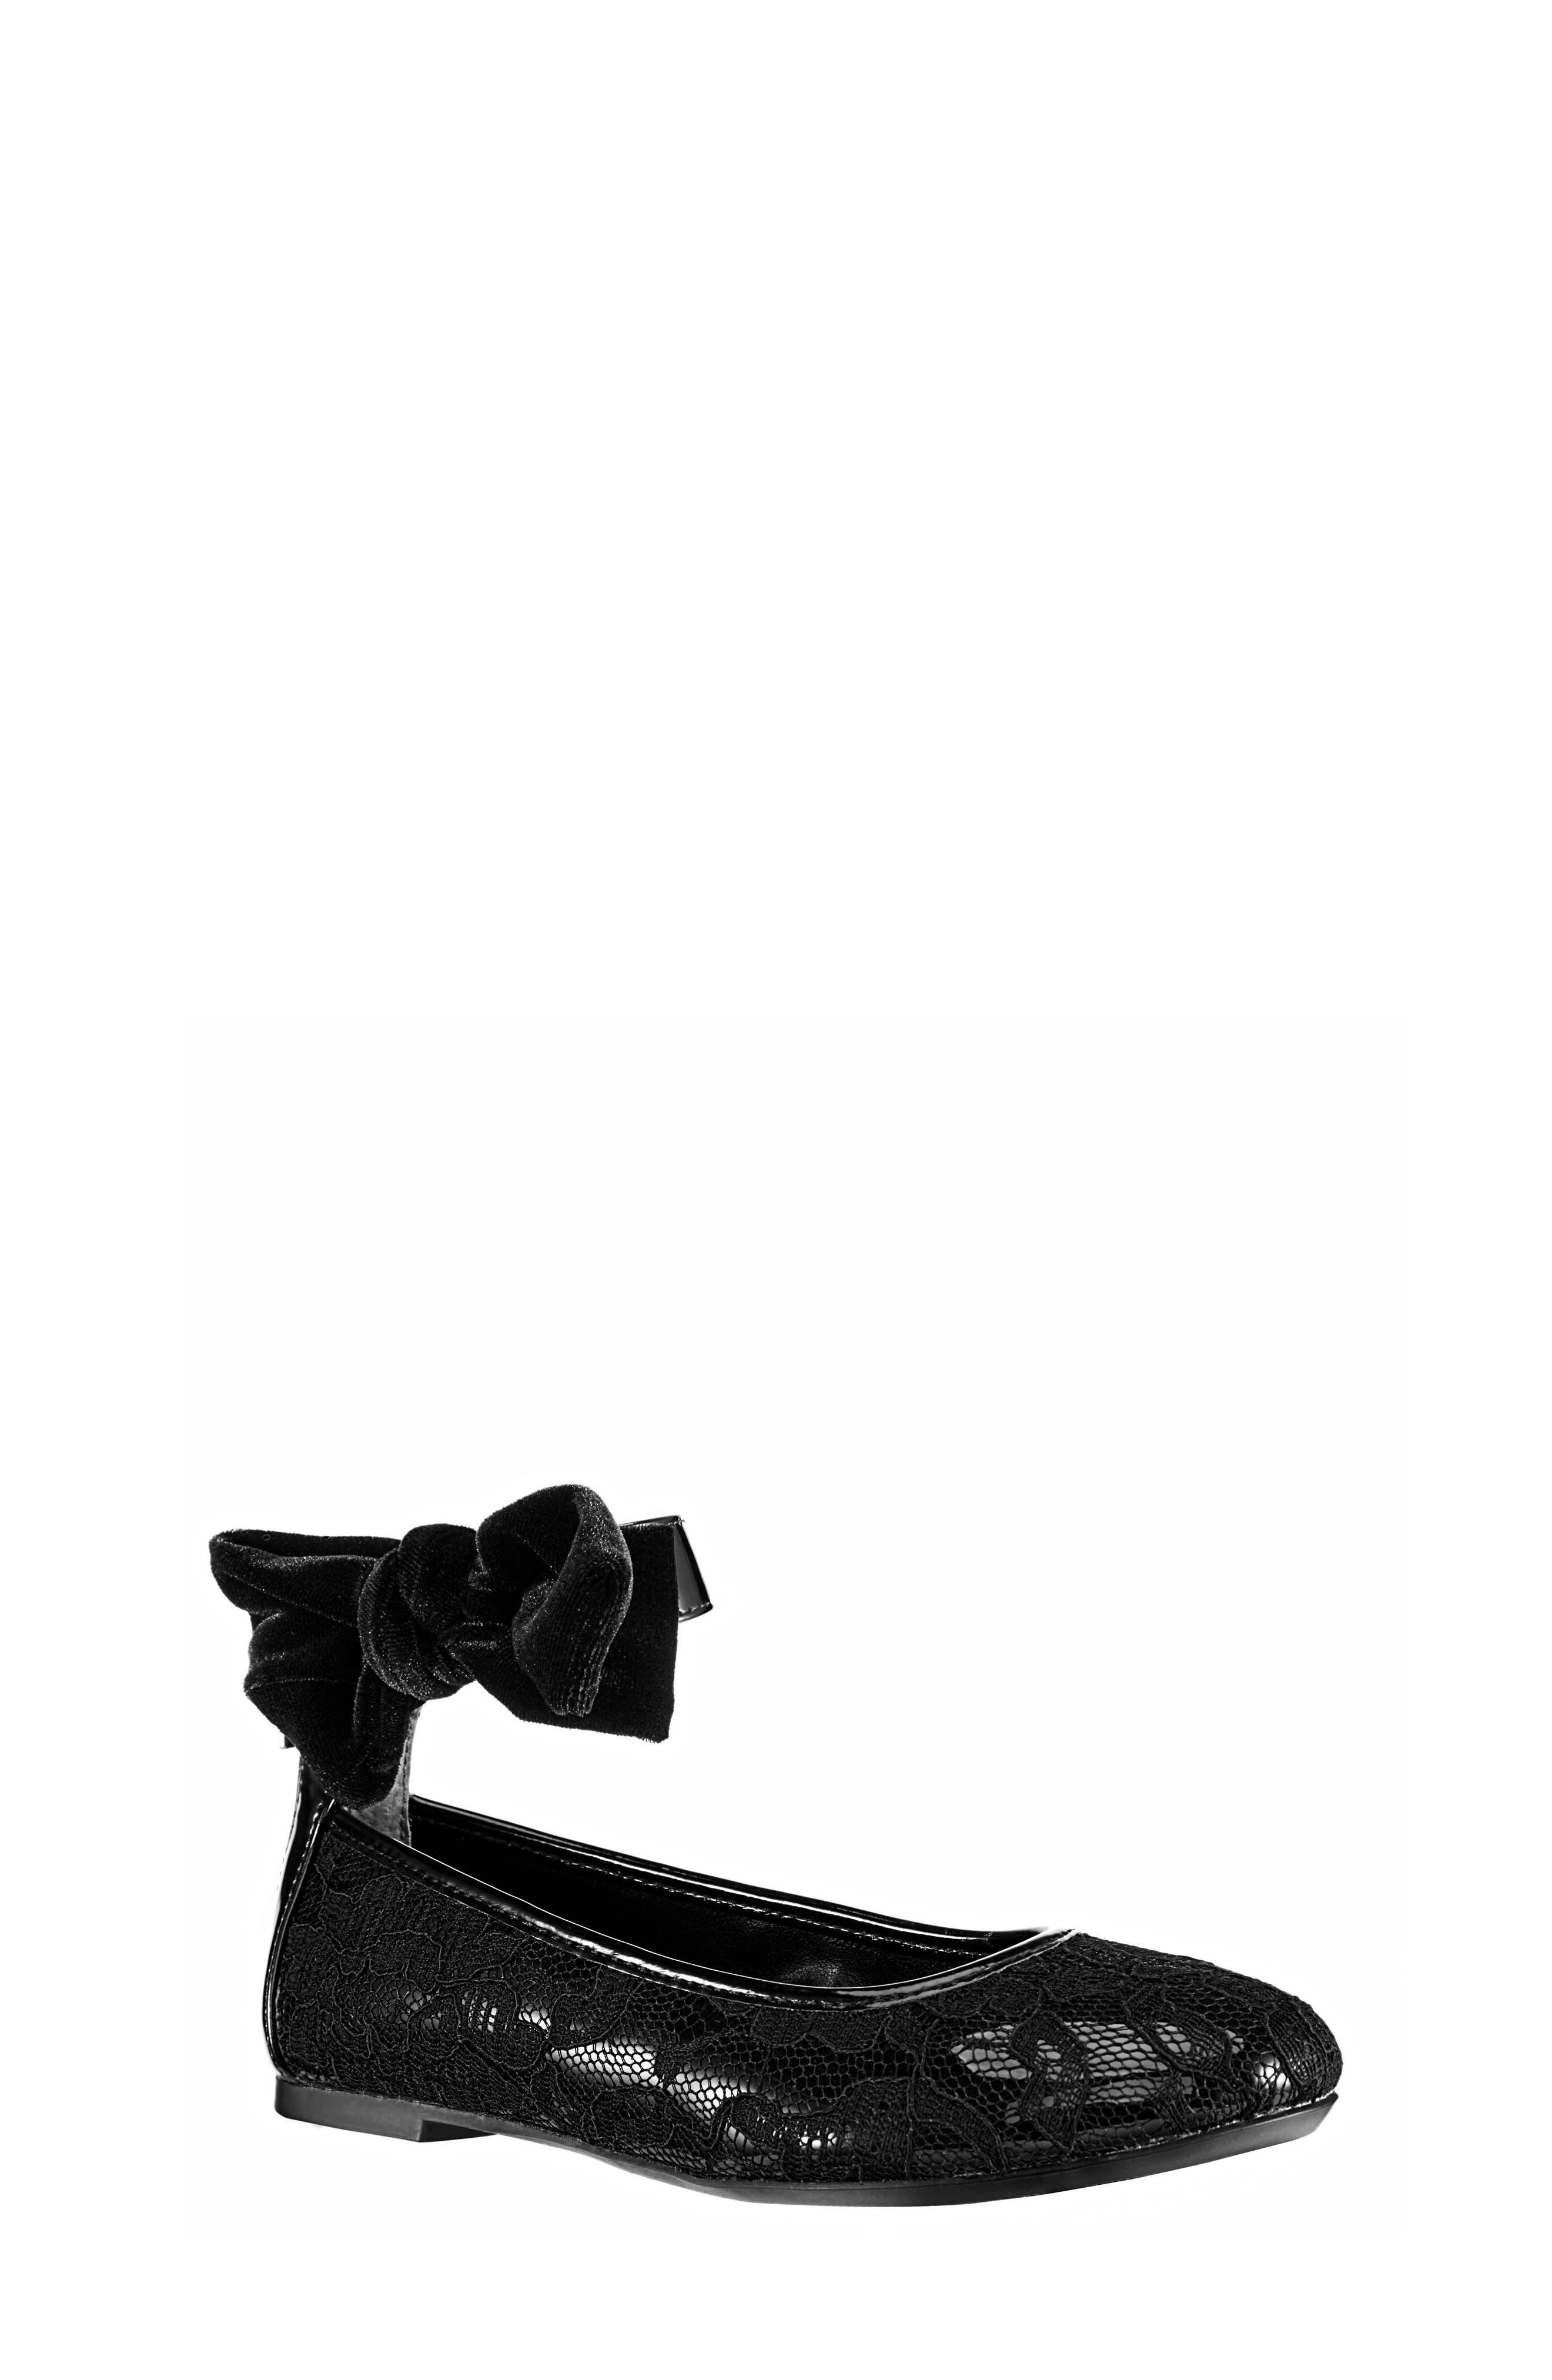 Alternate Image 1 Selected - Nina Maribeth Ankle Wrap Lace Ballet Flat (Little Kid & Big Kid)